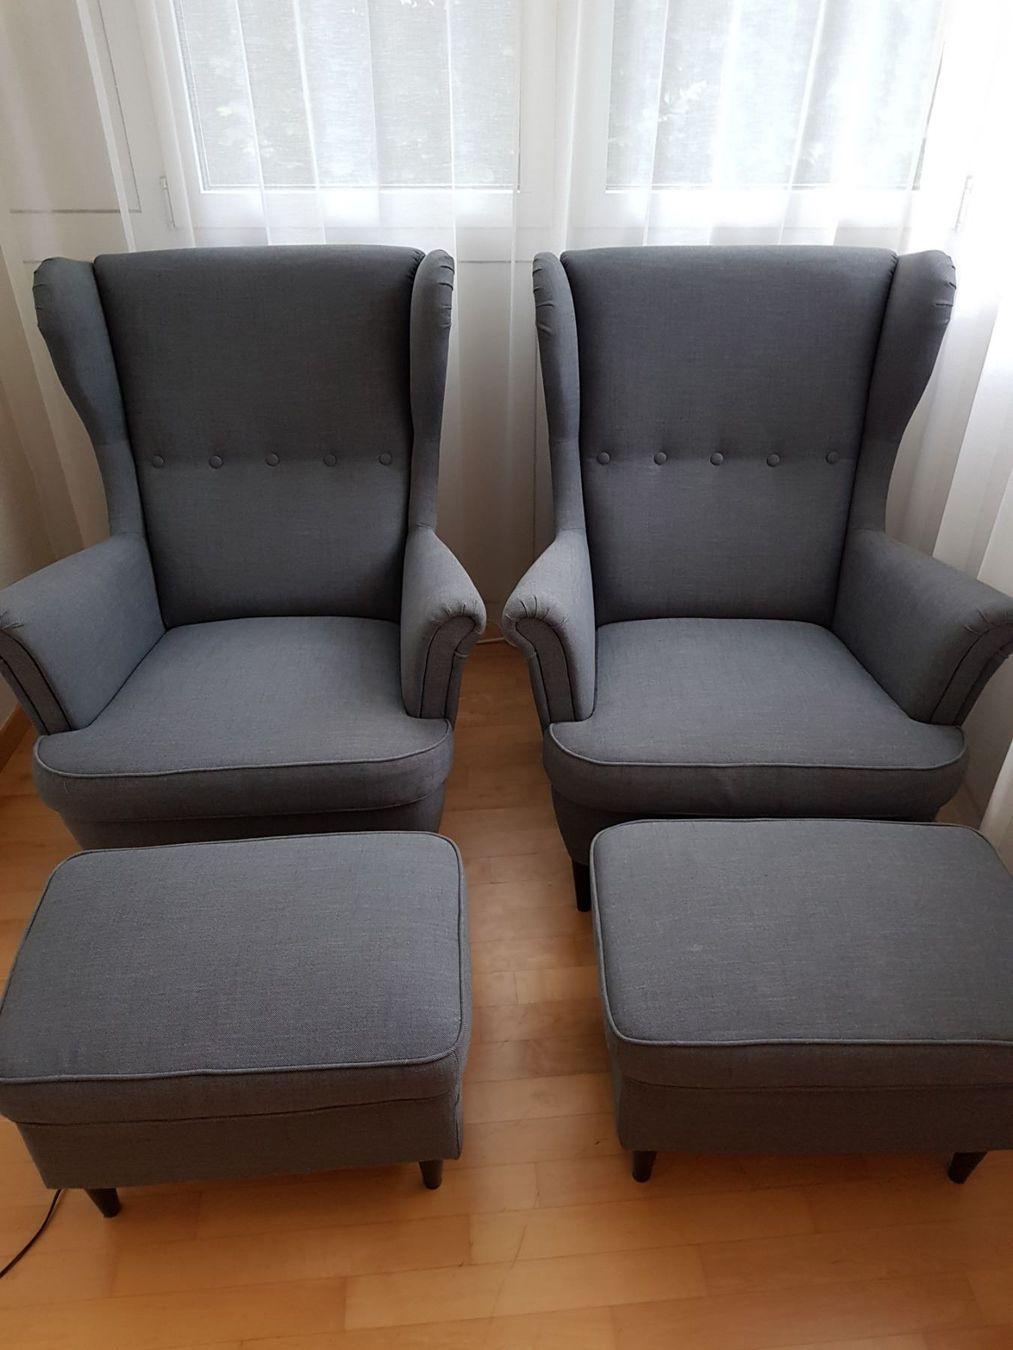 Ikea Sessel Mit Hocker Grau